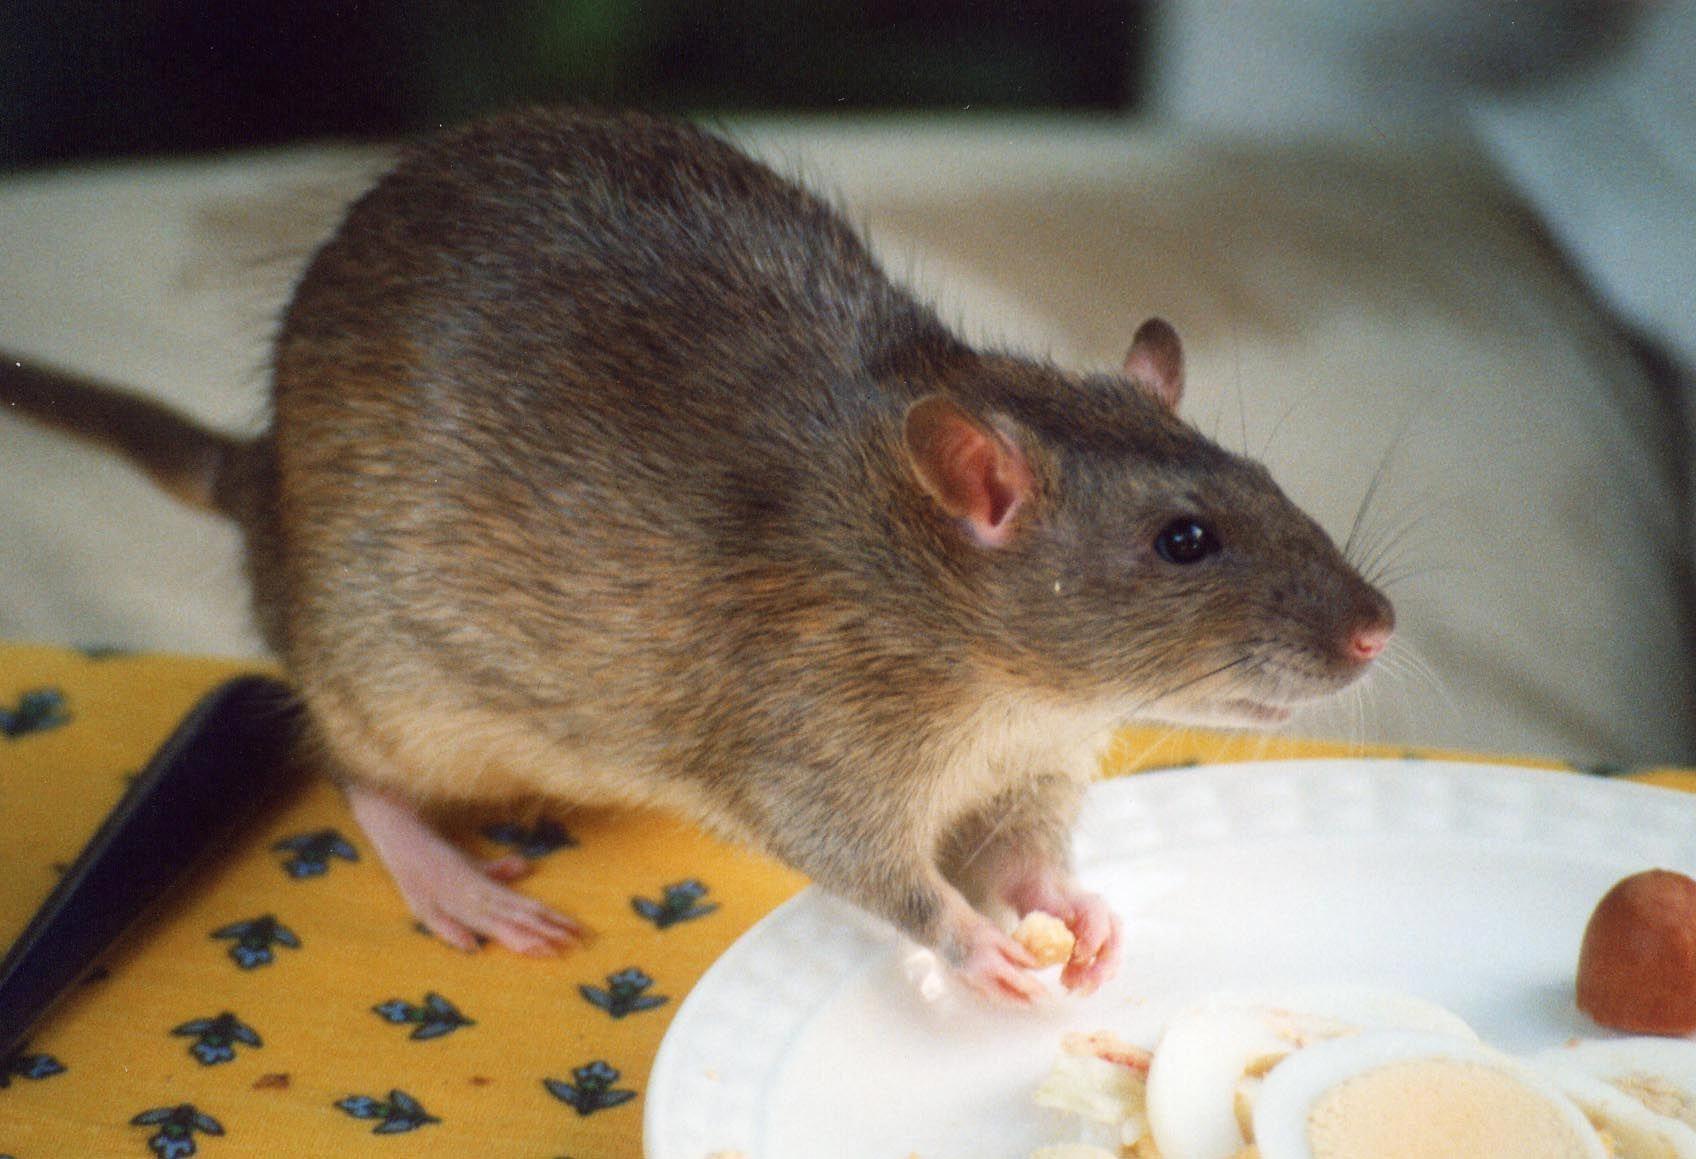 Pest Control Measures For Effective Flea Prevention In 2020 Pet Rats Animal Facts Safe Pest Control